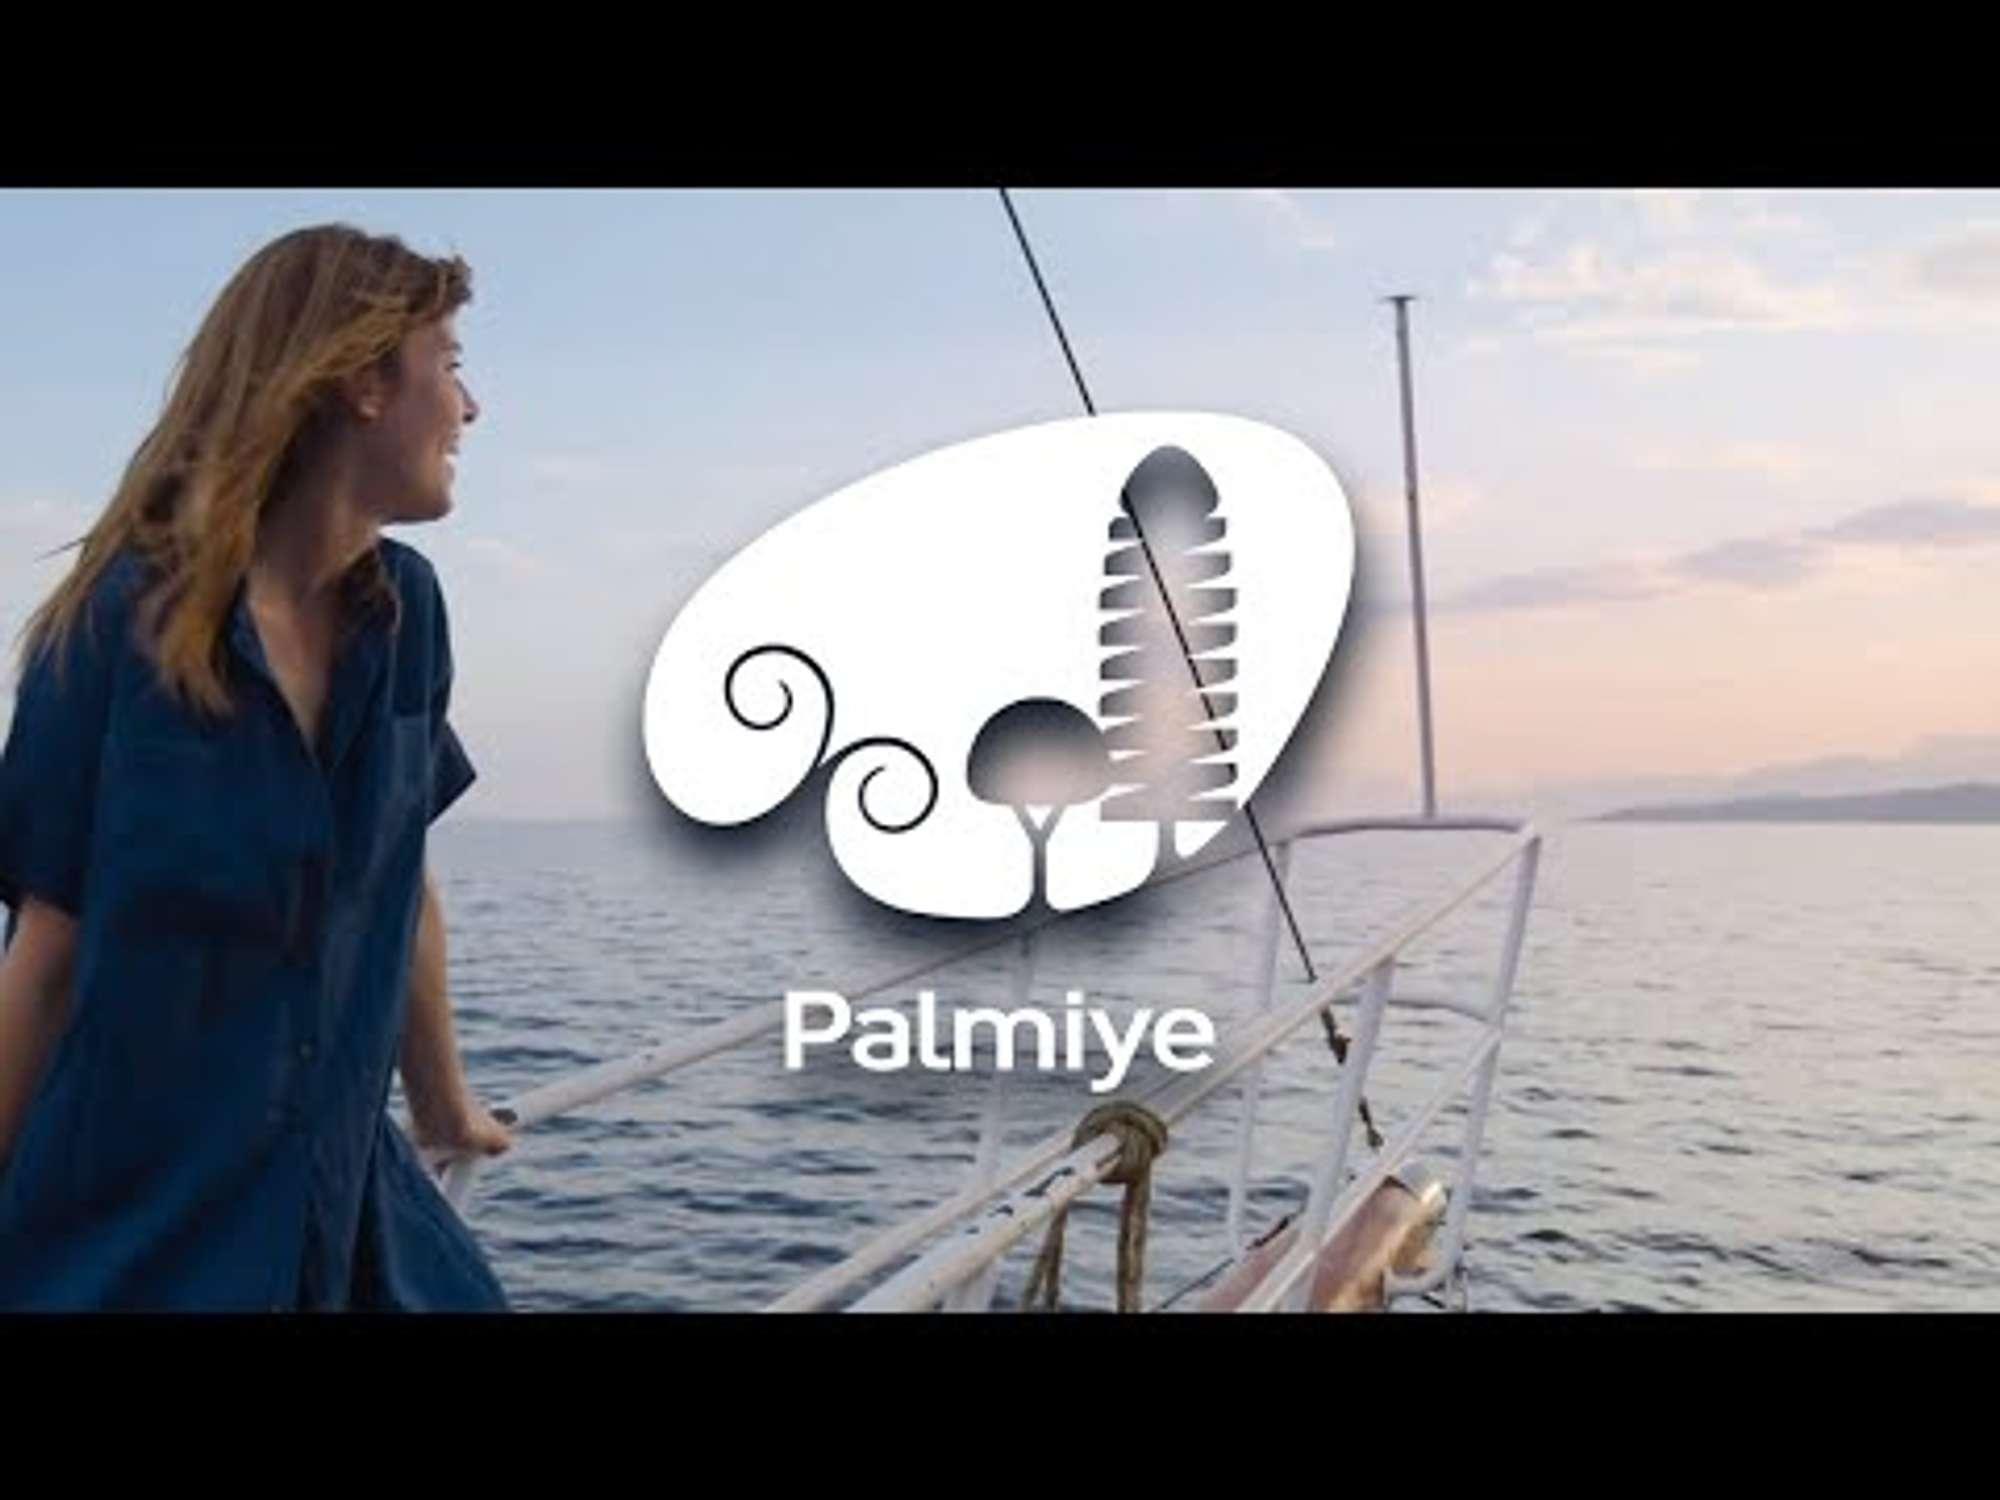 Open Palmiye videos slideshow gallery at 1